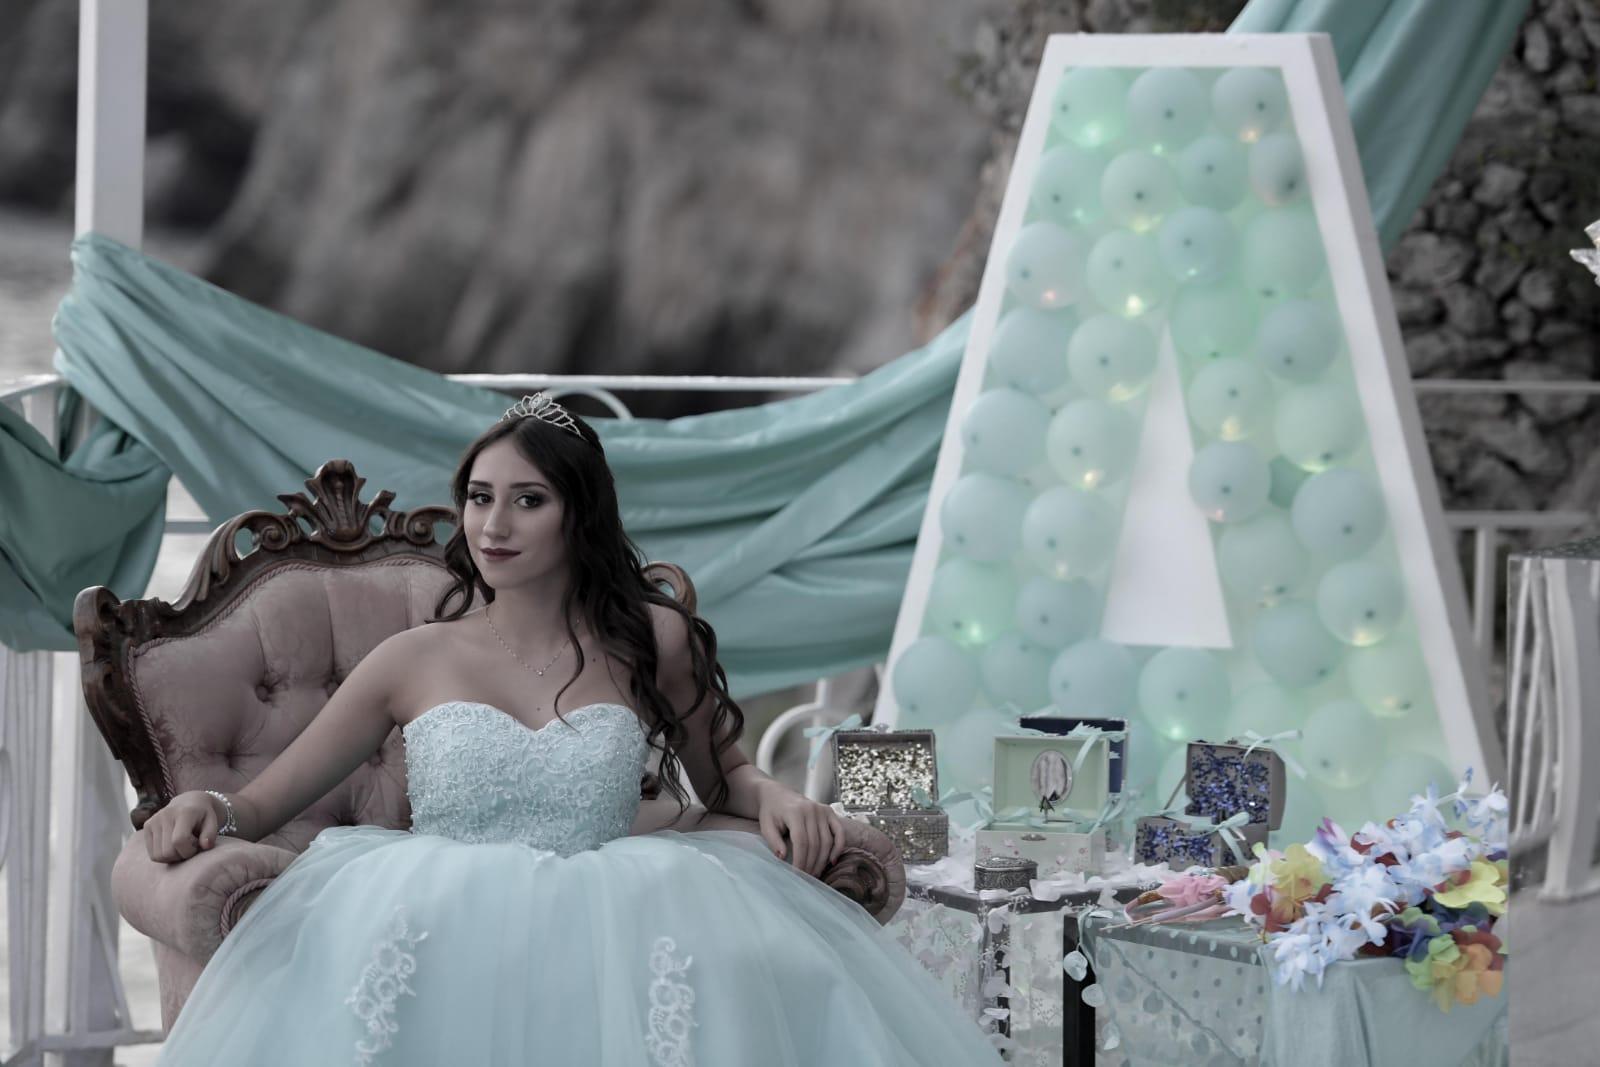 http://www.weddingamalfi.com/wp-content/uploads/Anastasias-18th-birthday.jpeg